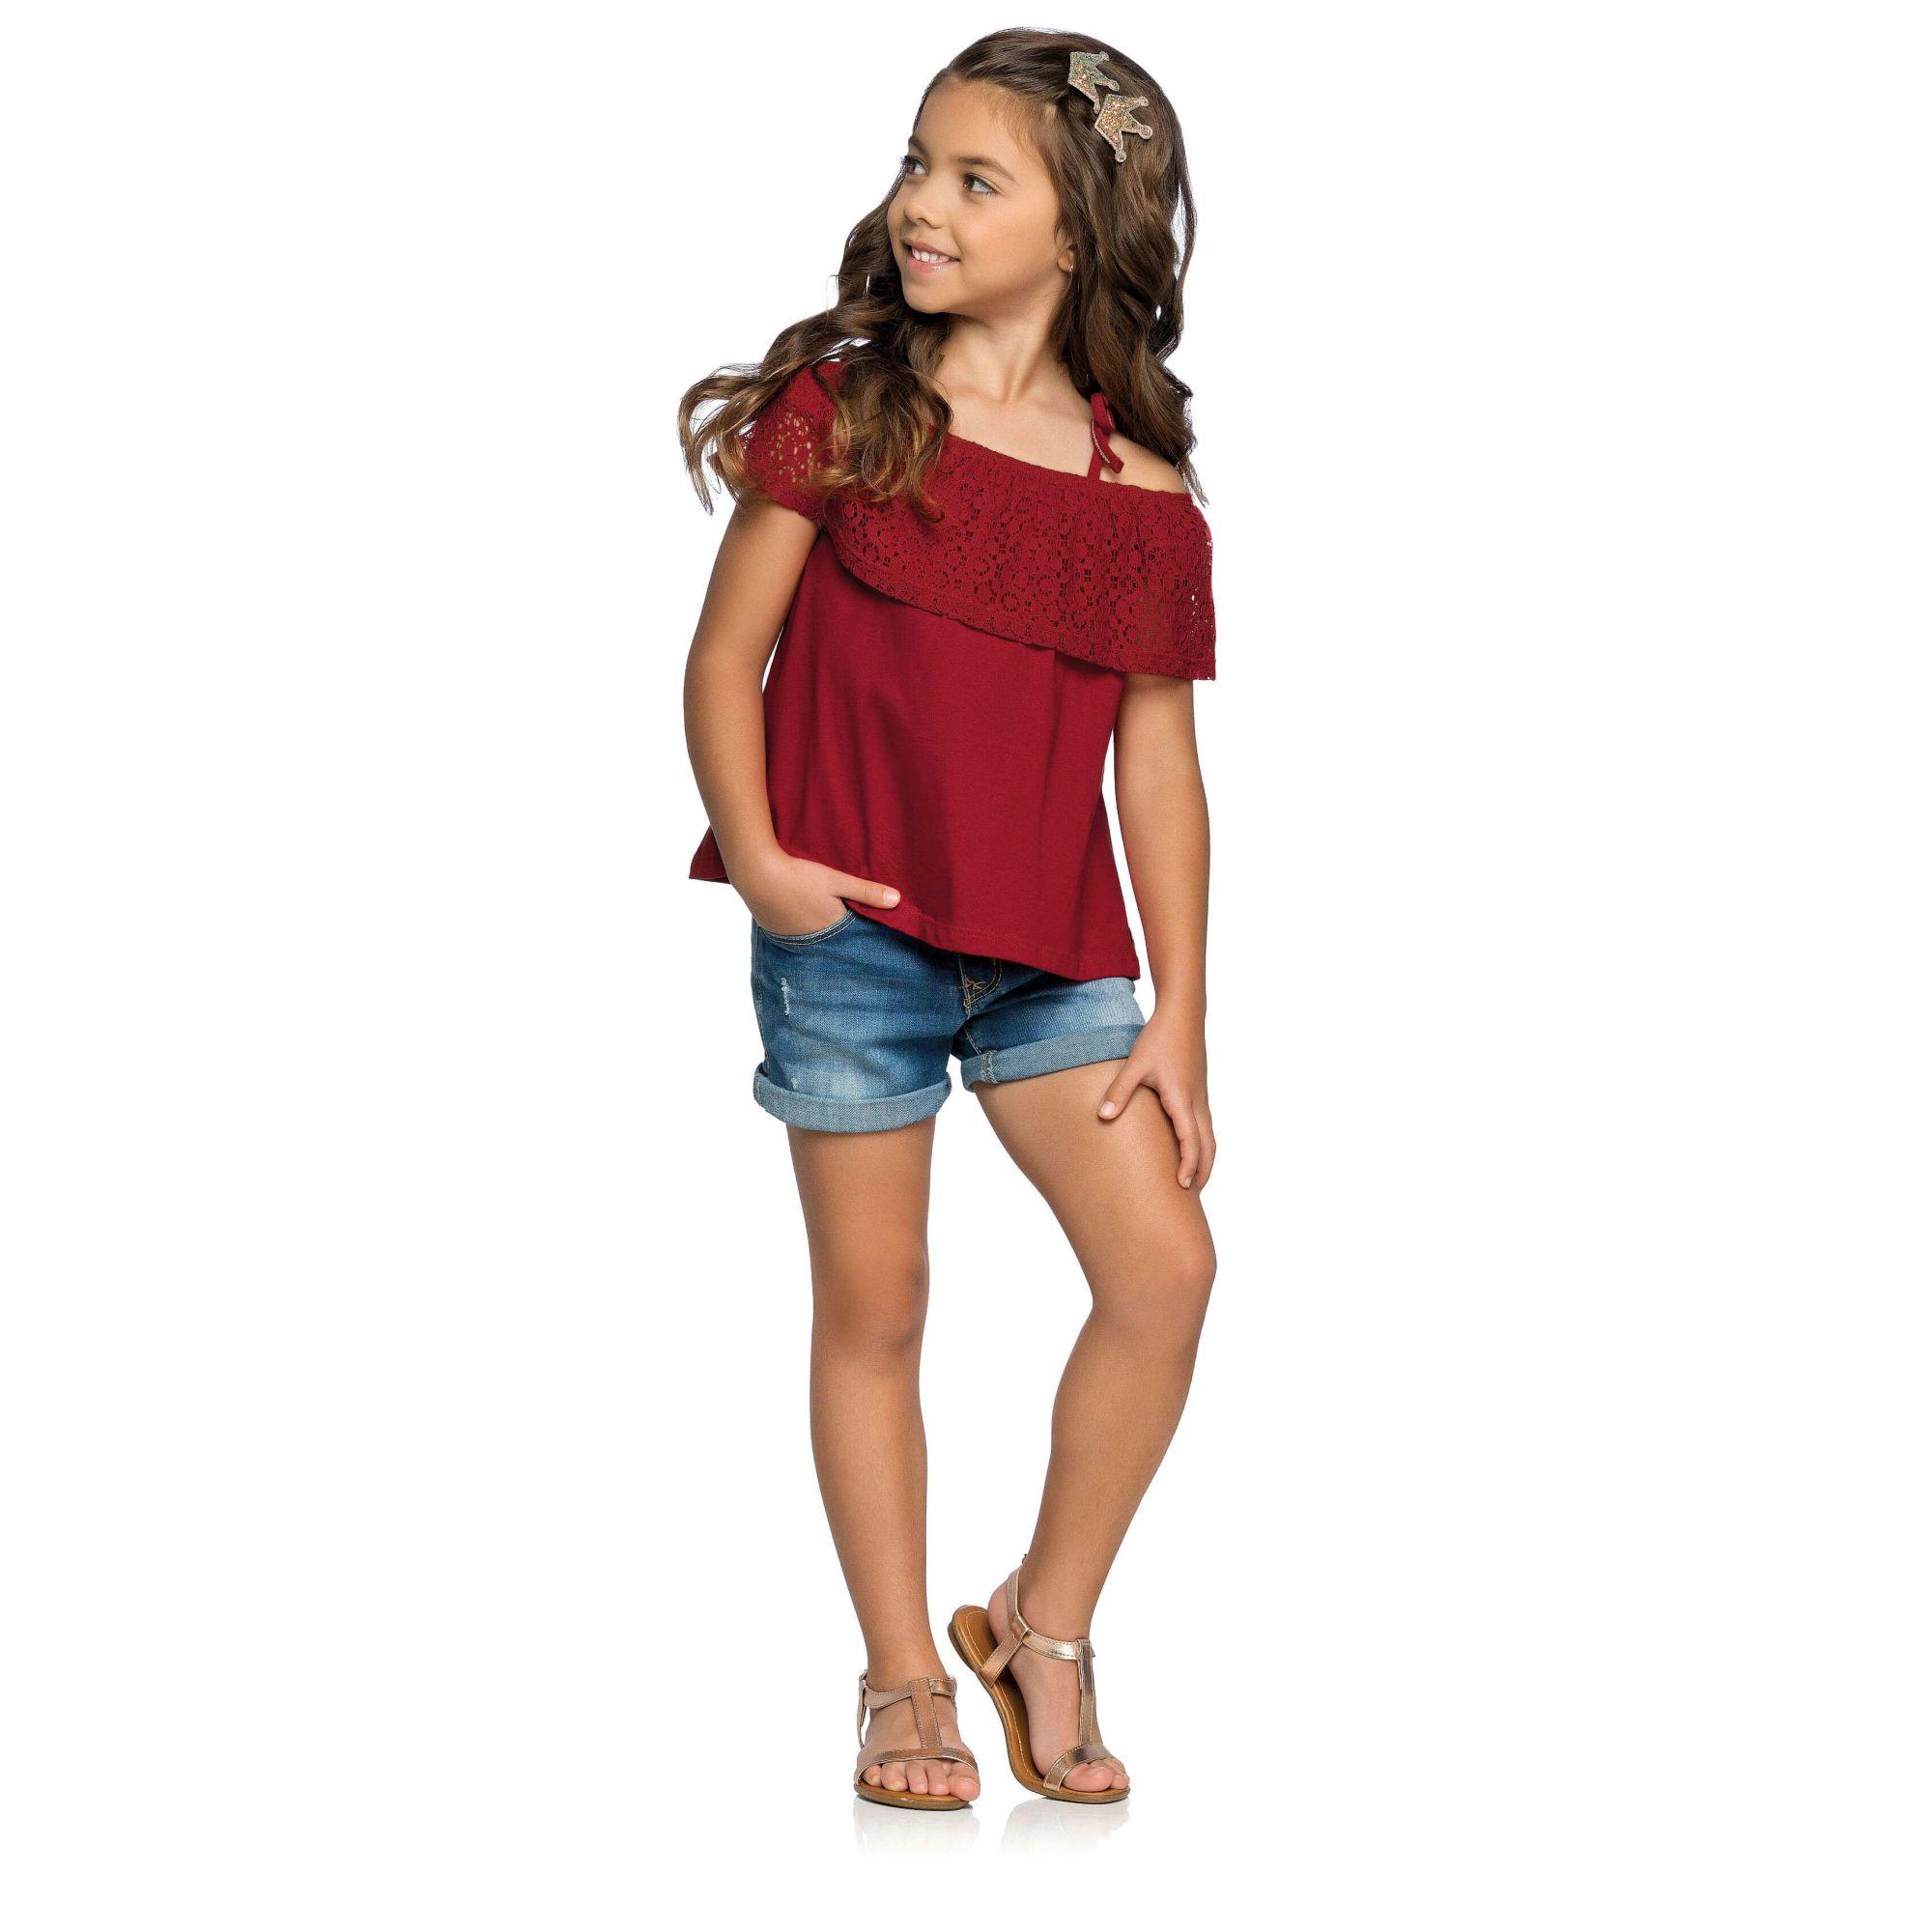 Blusa Infantil Vermelha Renda Elian